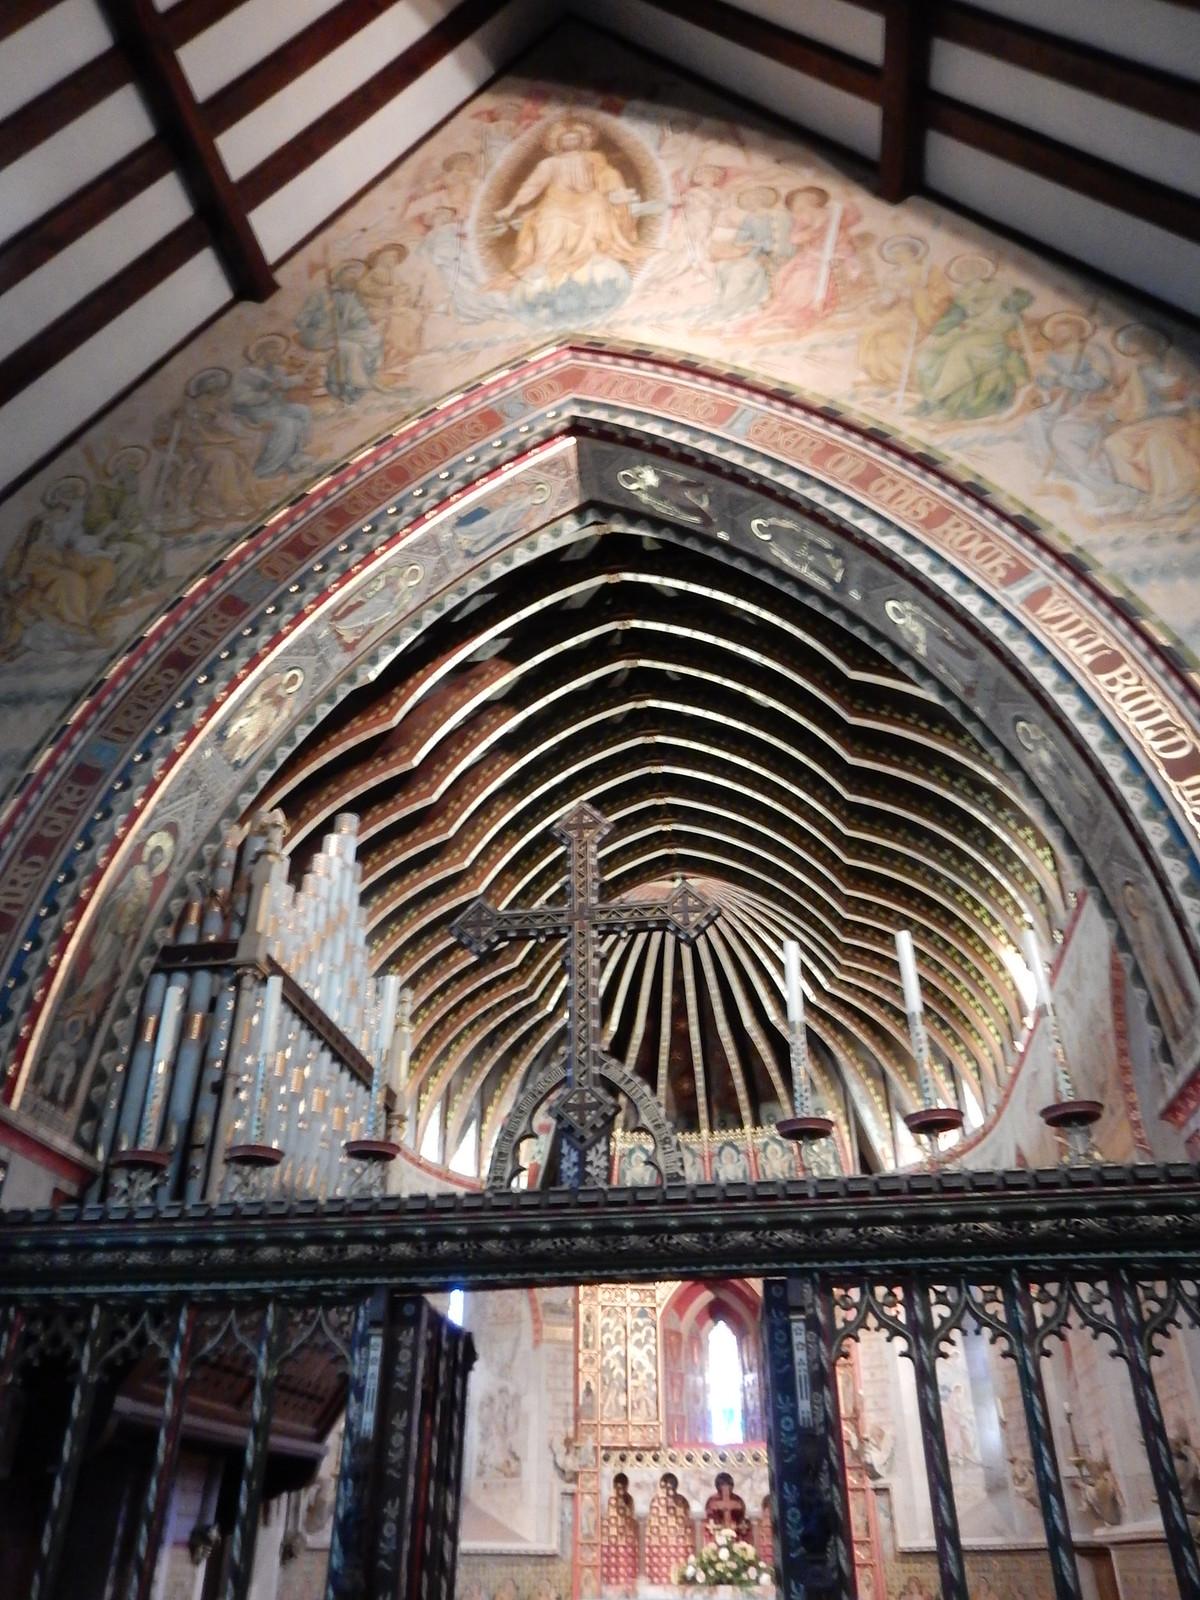 Hascombe church Milford to Godalming